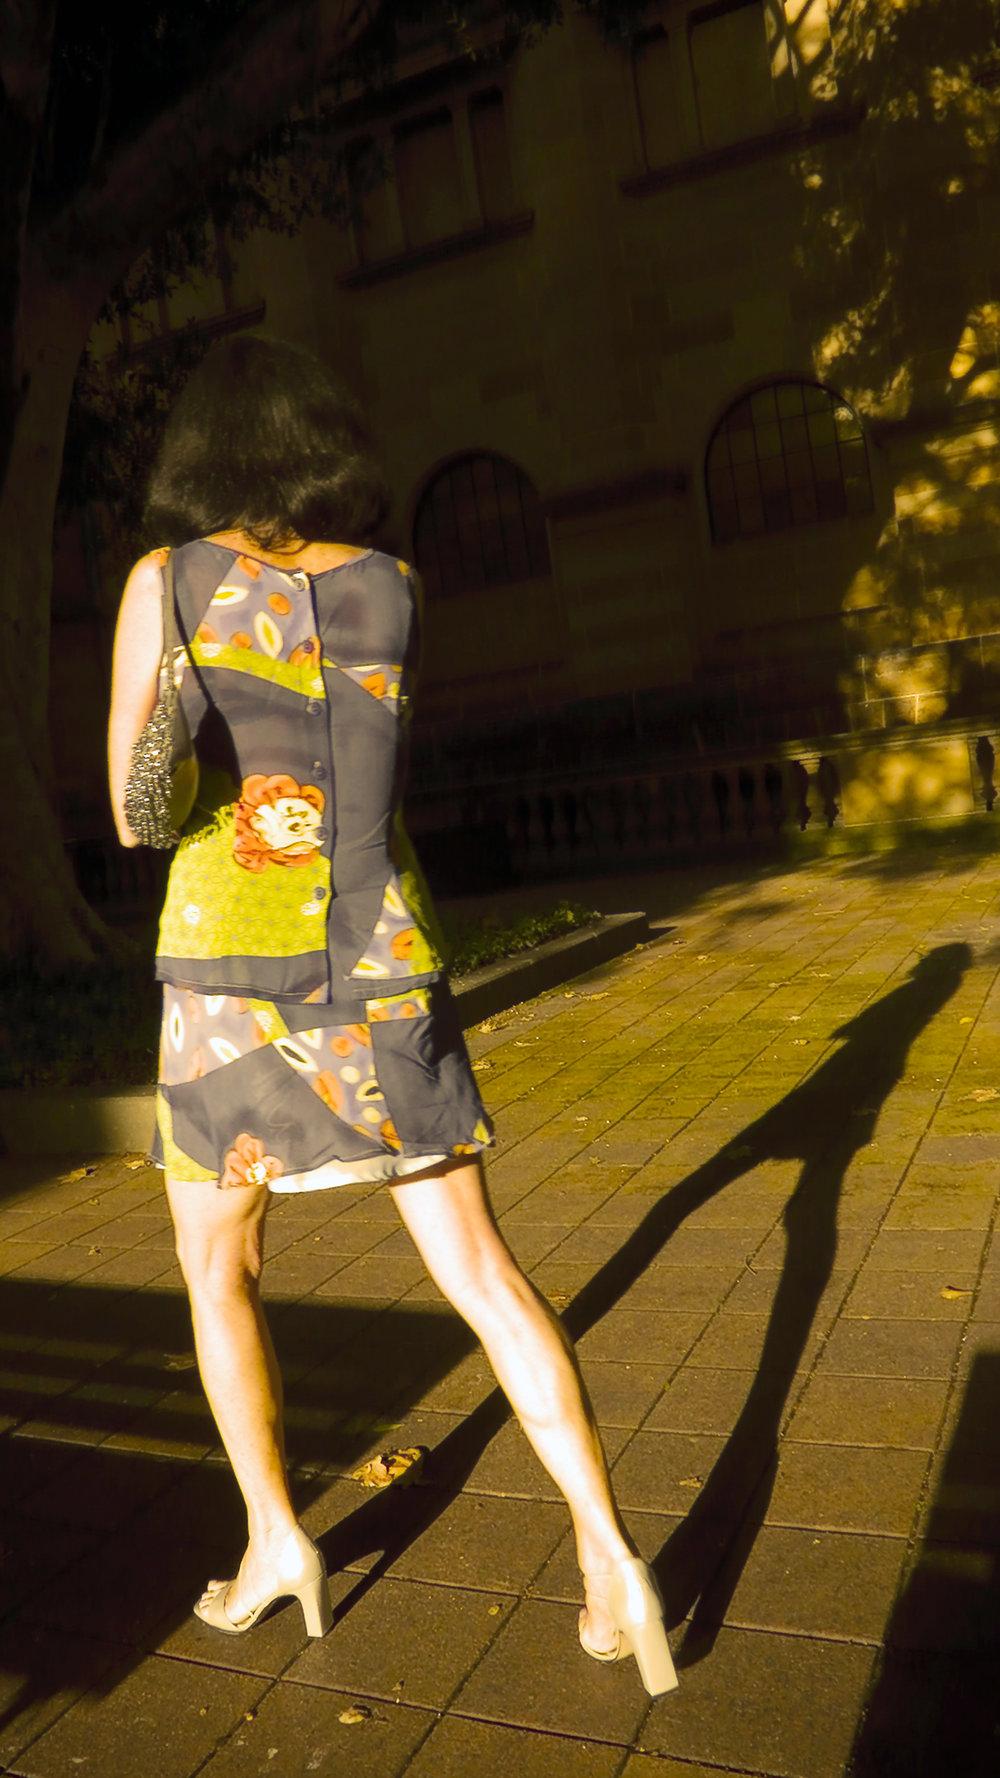 023_didi-s_gilson_australian_street_photography_tall_vertical_light_libraryofnsw_sydney_shadow_giacometti_2007.jpg